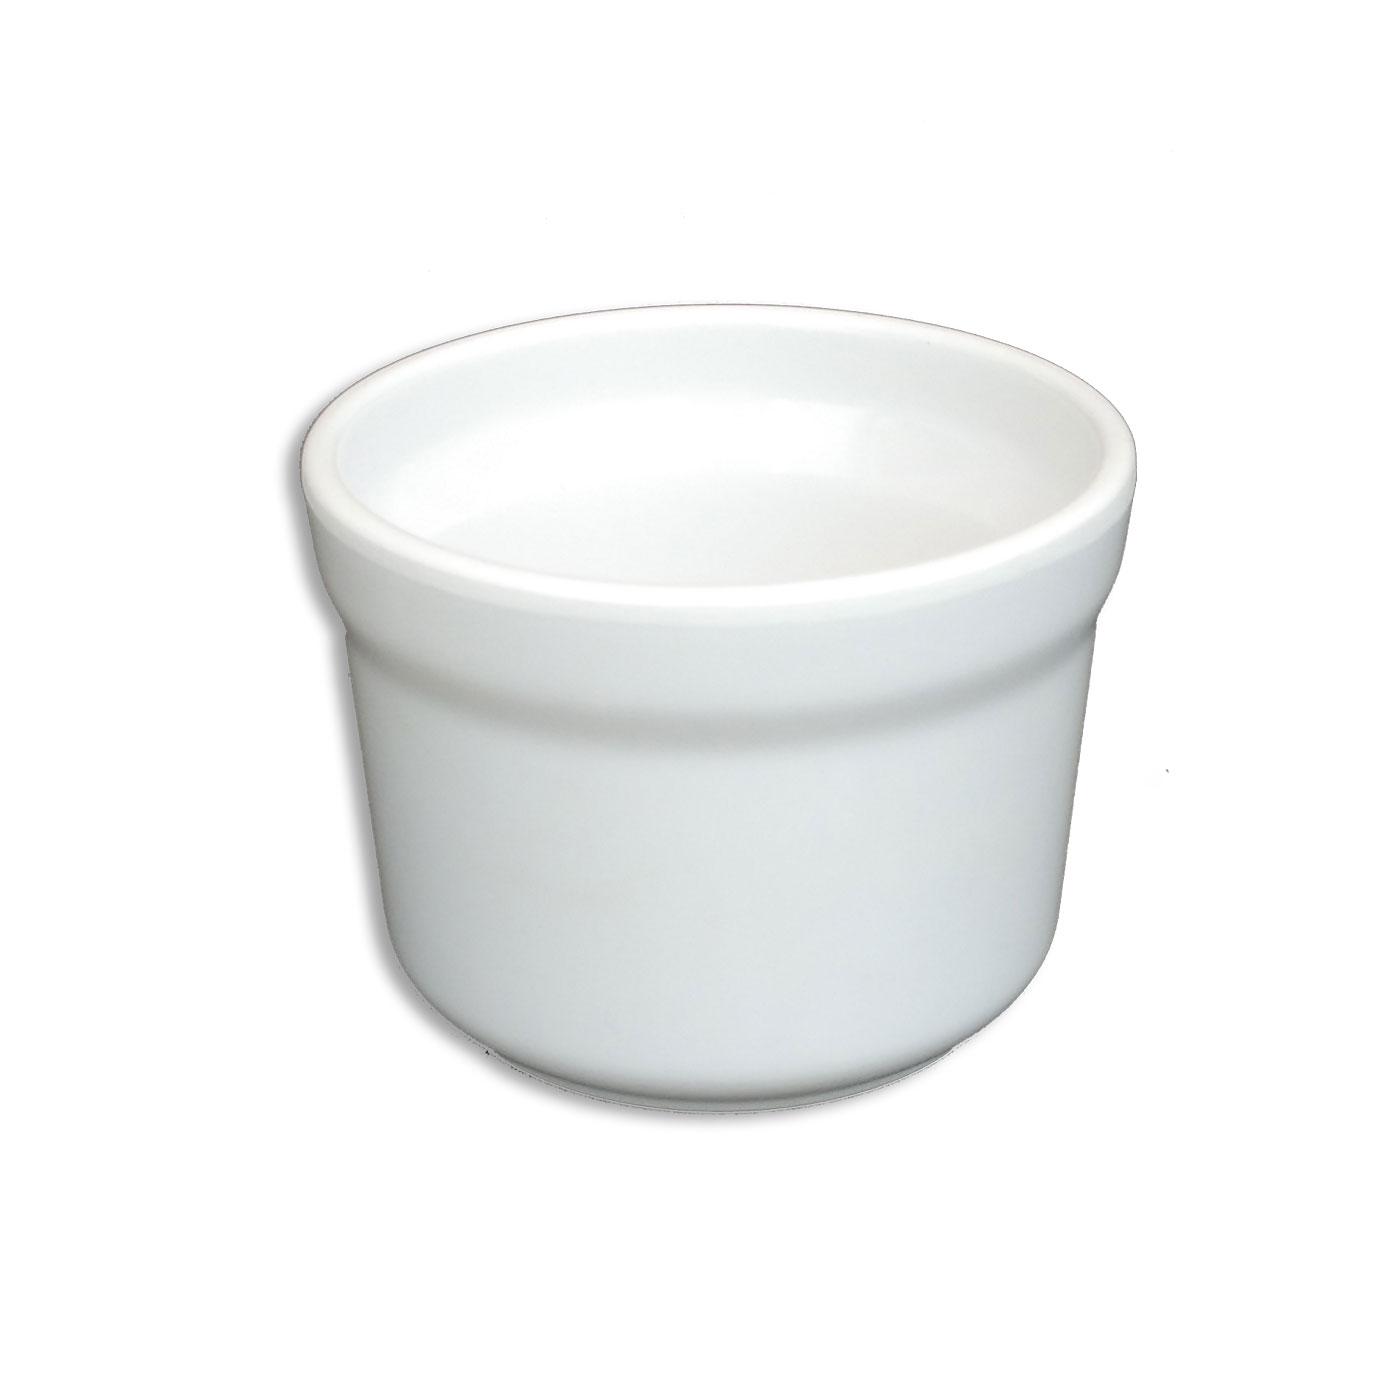 Mangkuk Sup Dengan Tutup Higienis Daftar Harga Terlengkap Mangkok Persegi 6 W2606 Golden Dragon Melamine Sop Oriental 35 Inch Putih Glori Gwa31h Pth